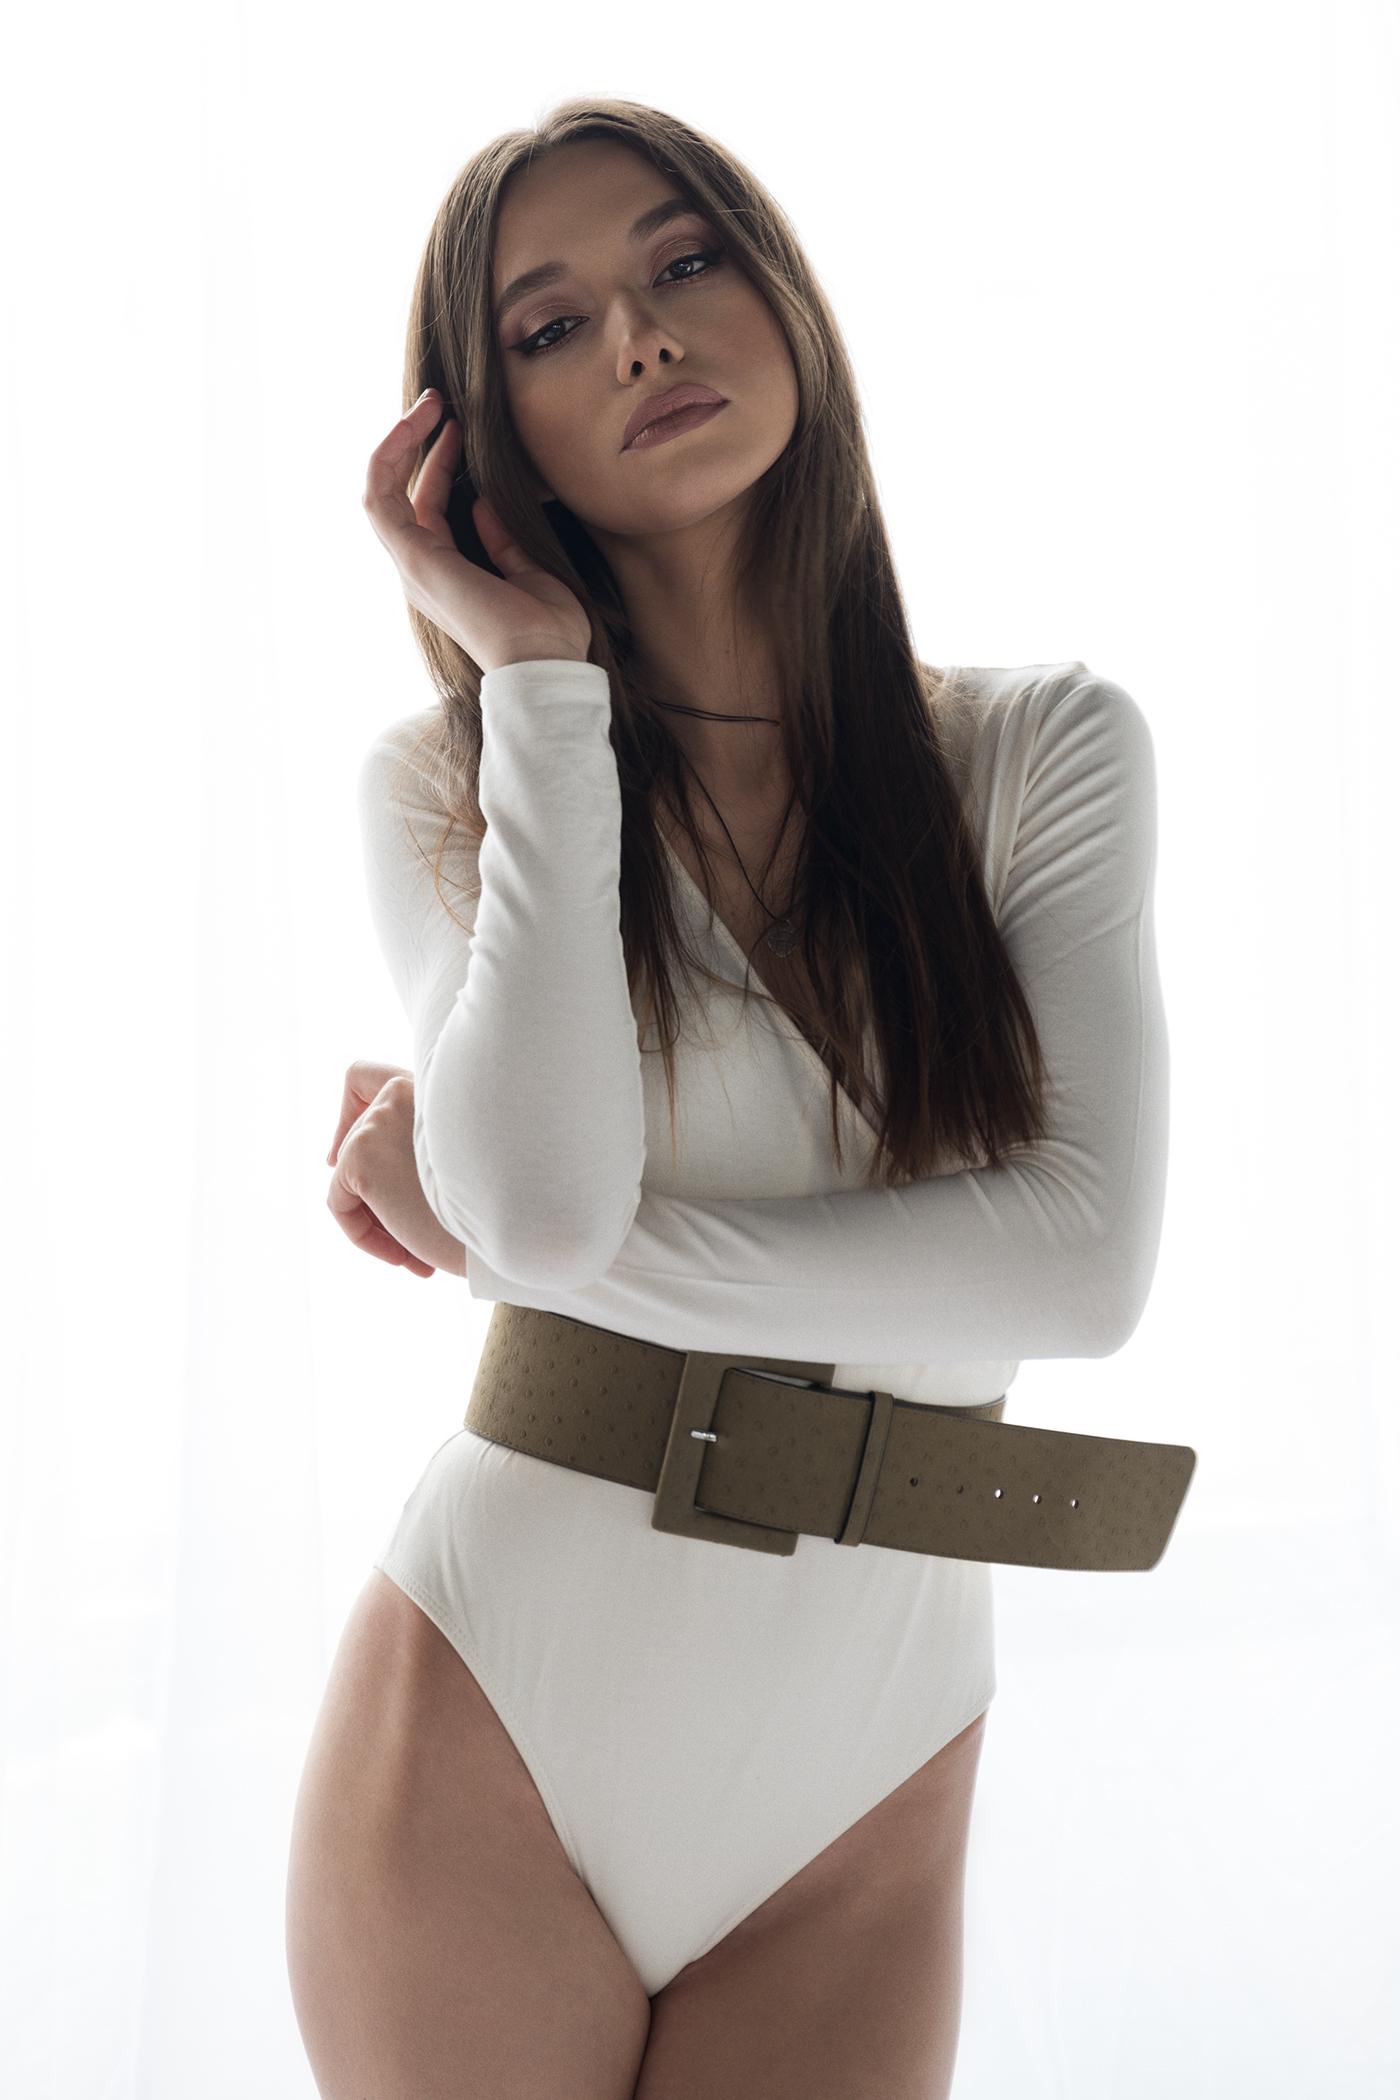 People 1400x2100 Carla Truica Bogdan Moldovan Behance brunette sensual gaze white dress women